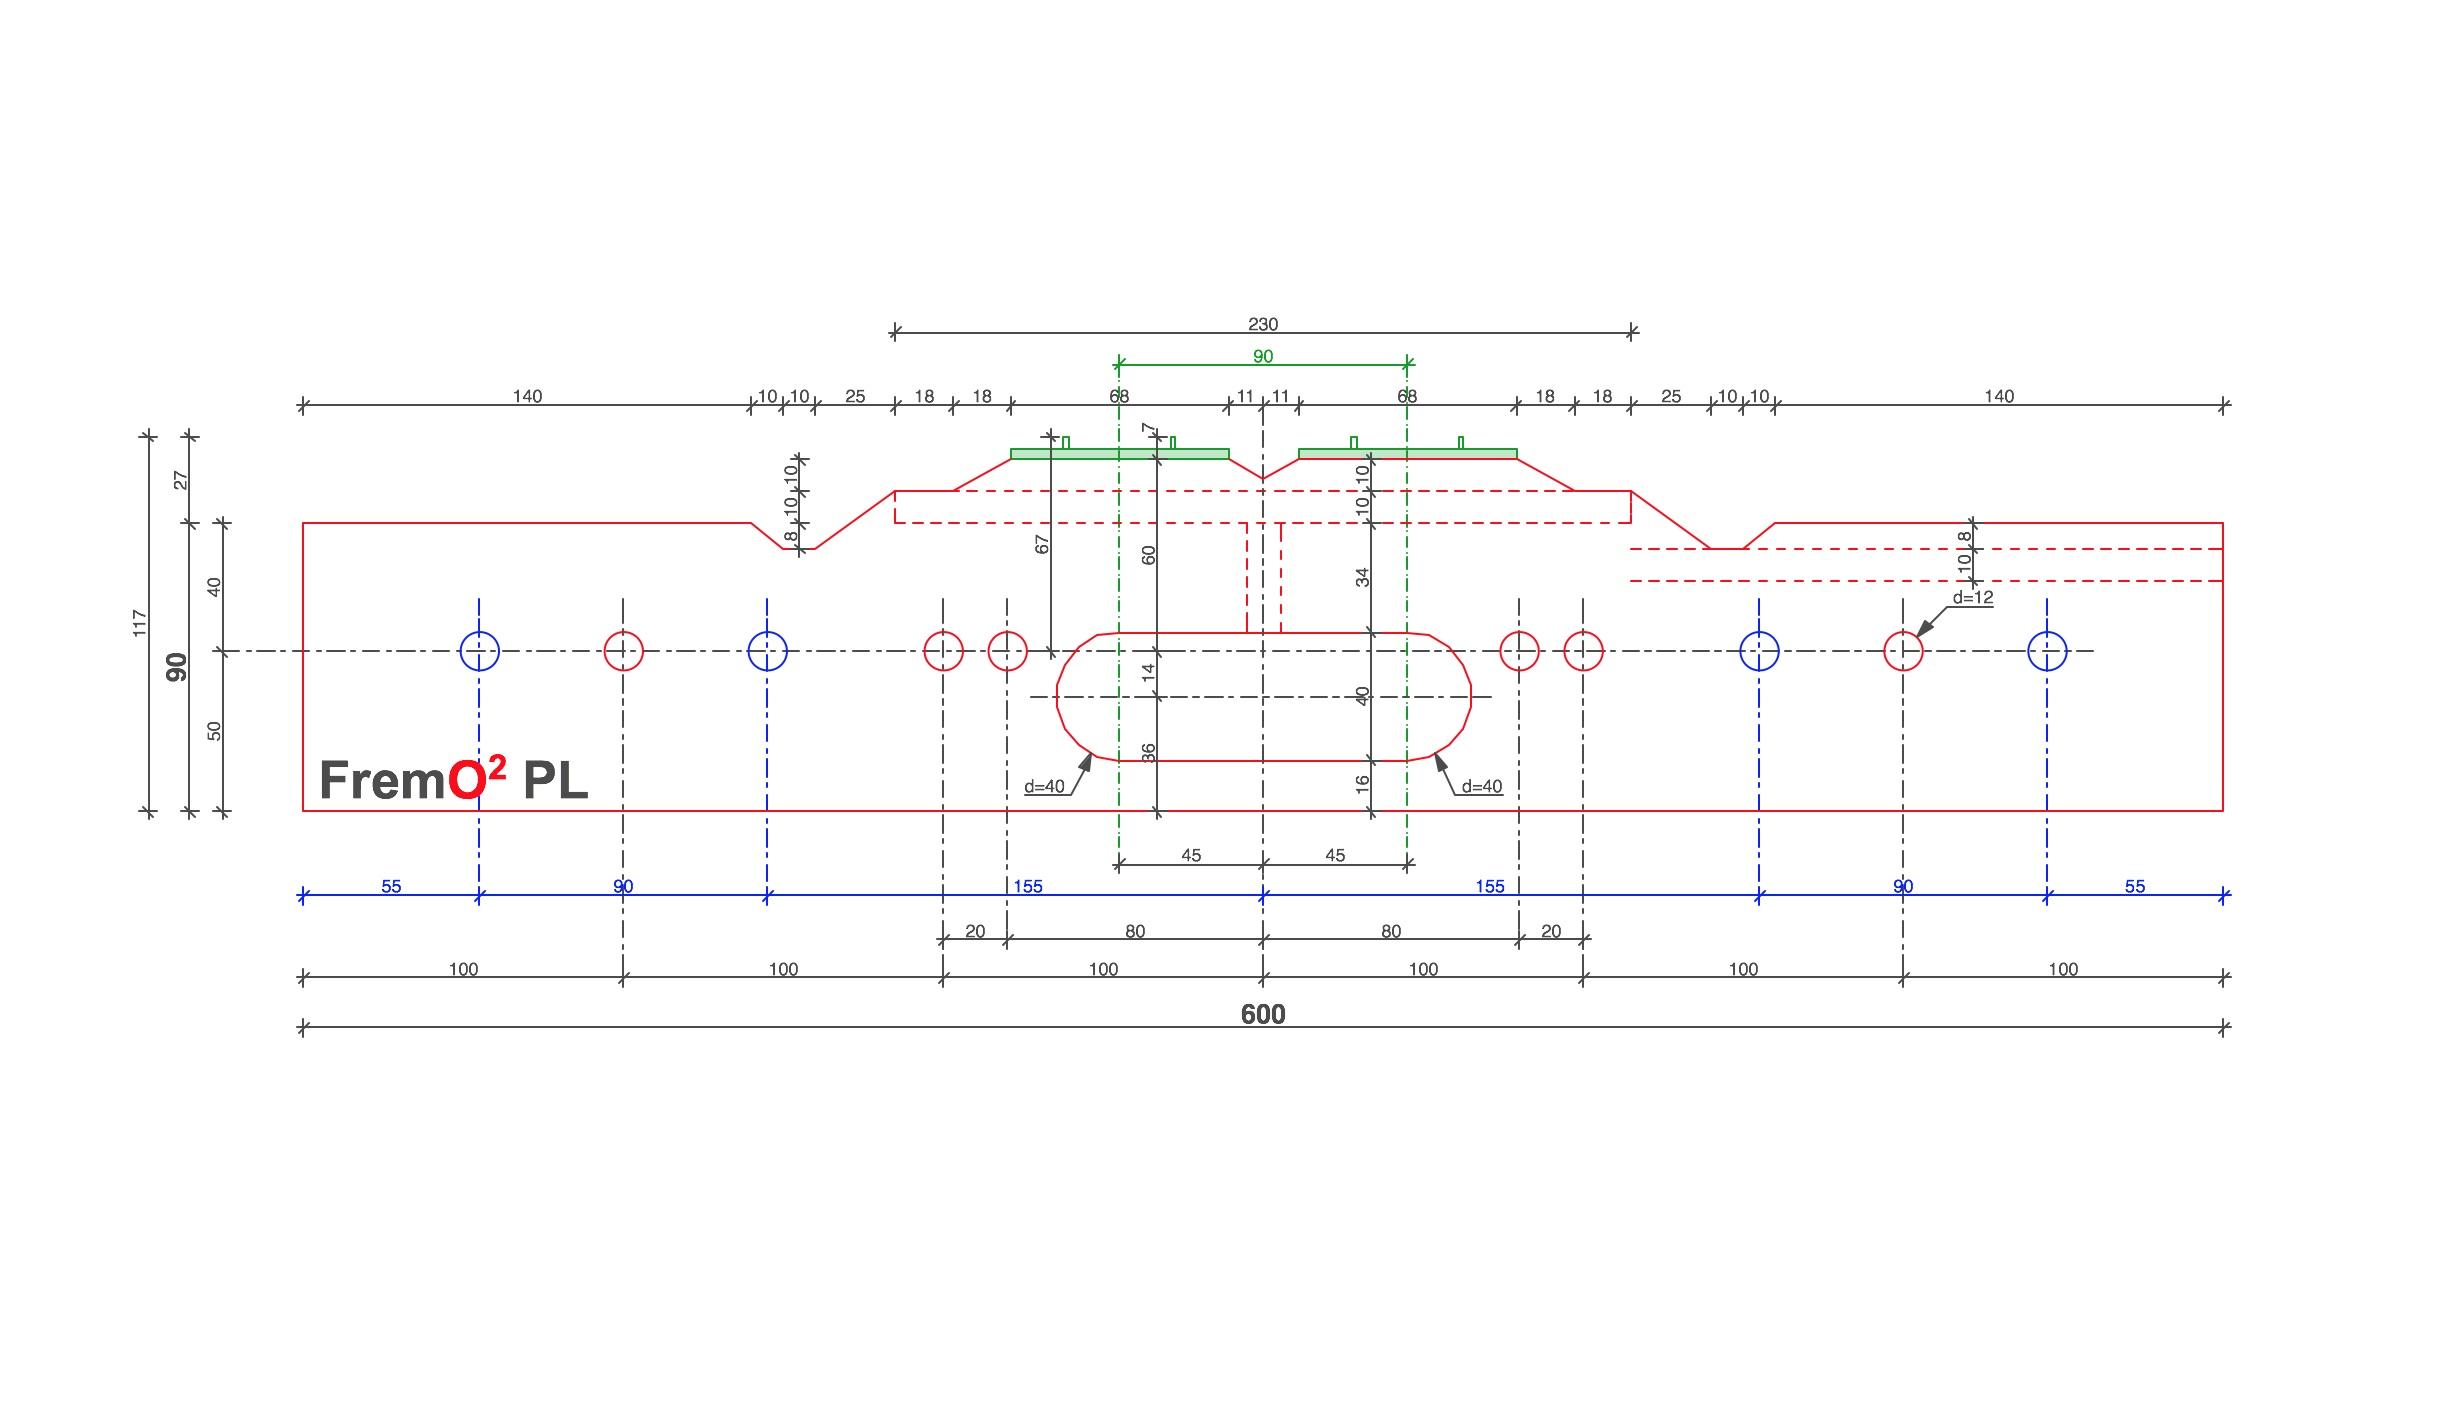 Profil FremO2 PL 600.jpg